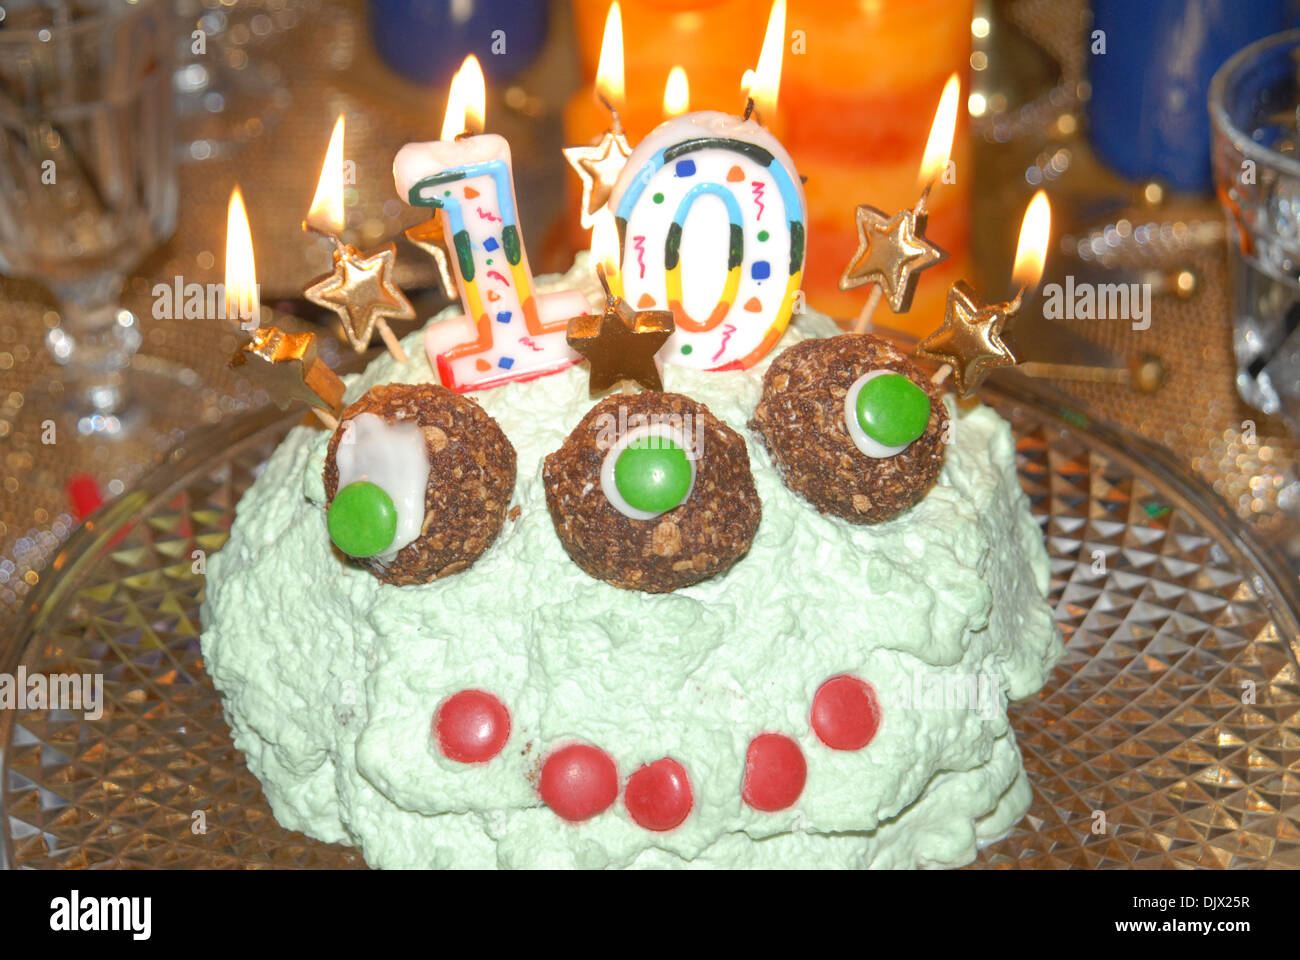 Fantastic Crazy Alien Birthday Cake Stock Photo 63267395 Alamy Funny Birthday Cards Online Elaedamsfinfo